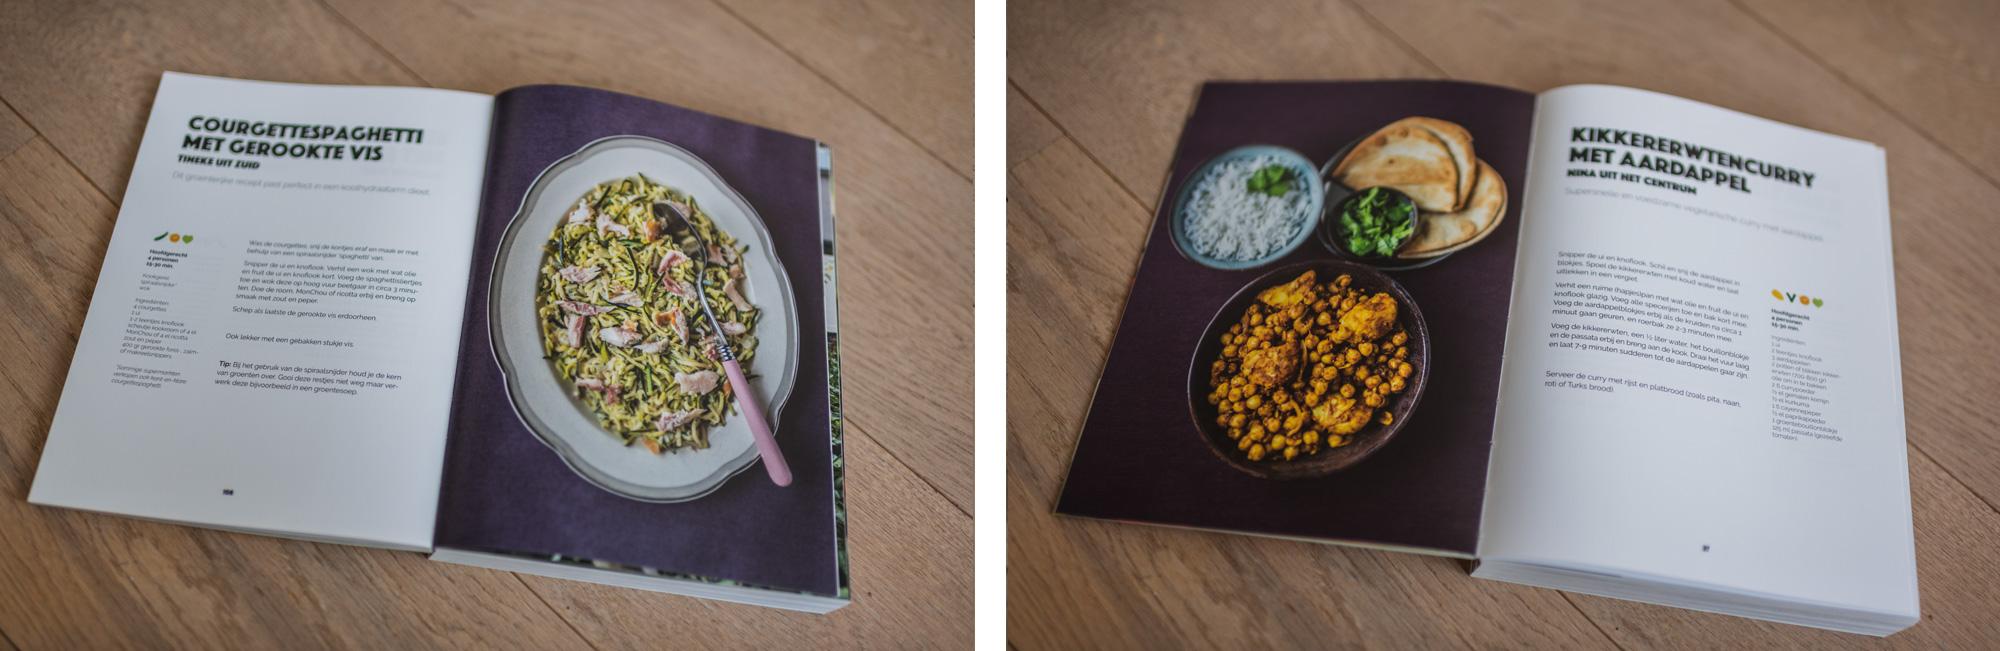 kookboek3.jpg